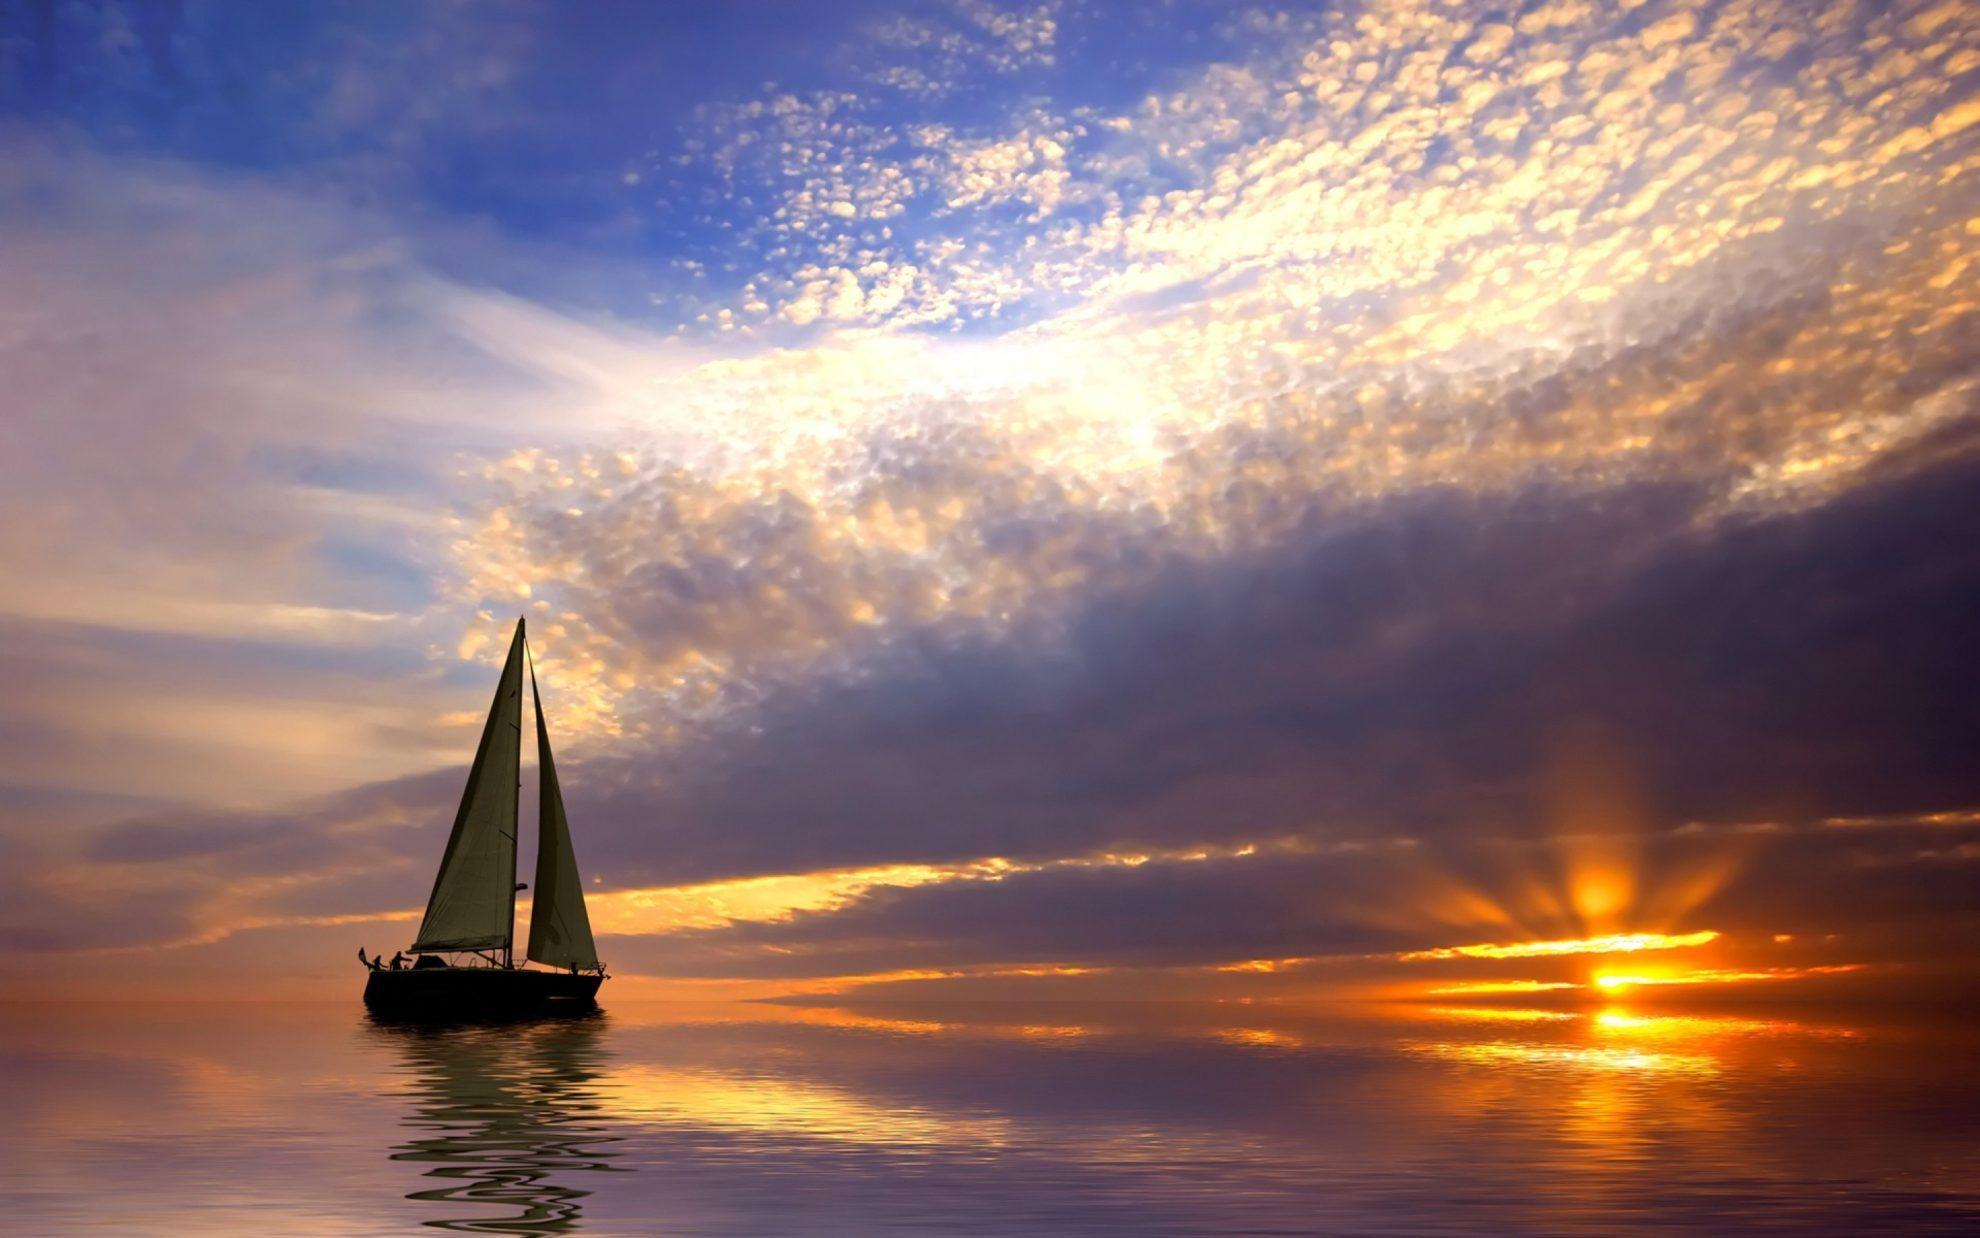 boat-sea-dusk-nature-wallpaper-1800x2880